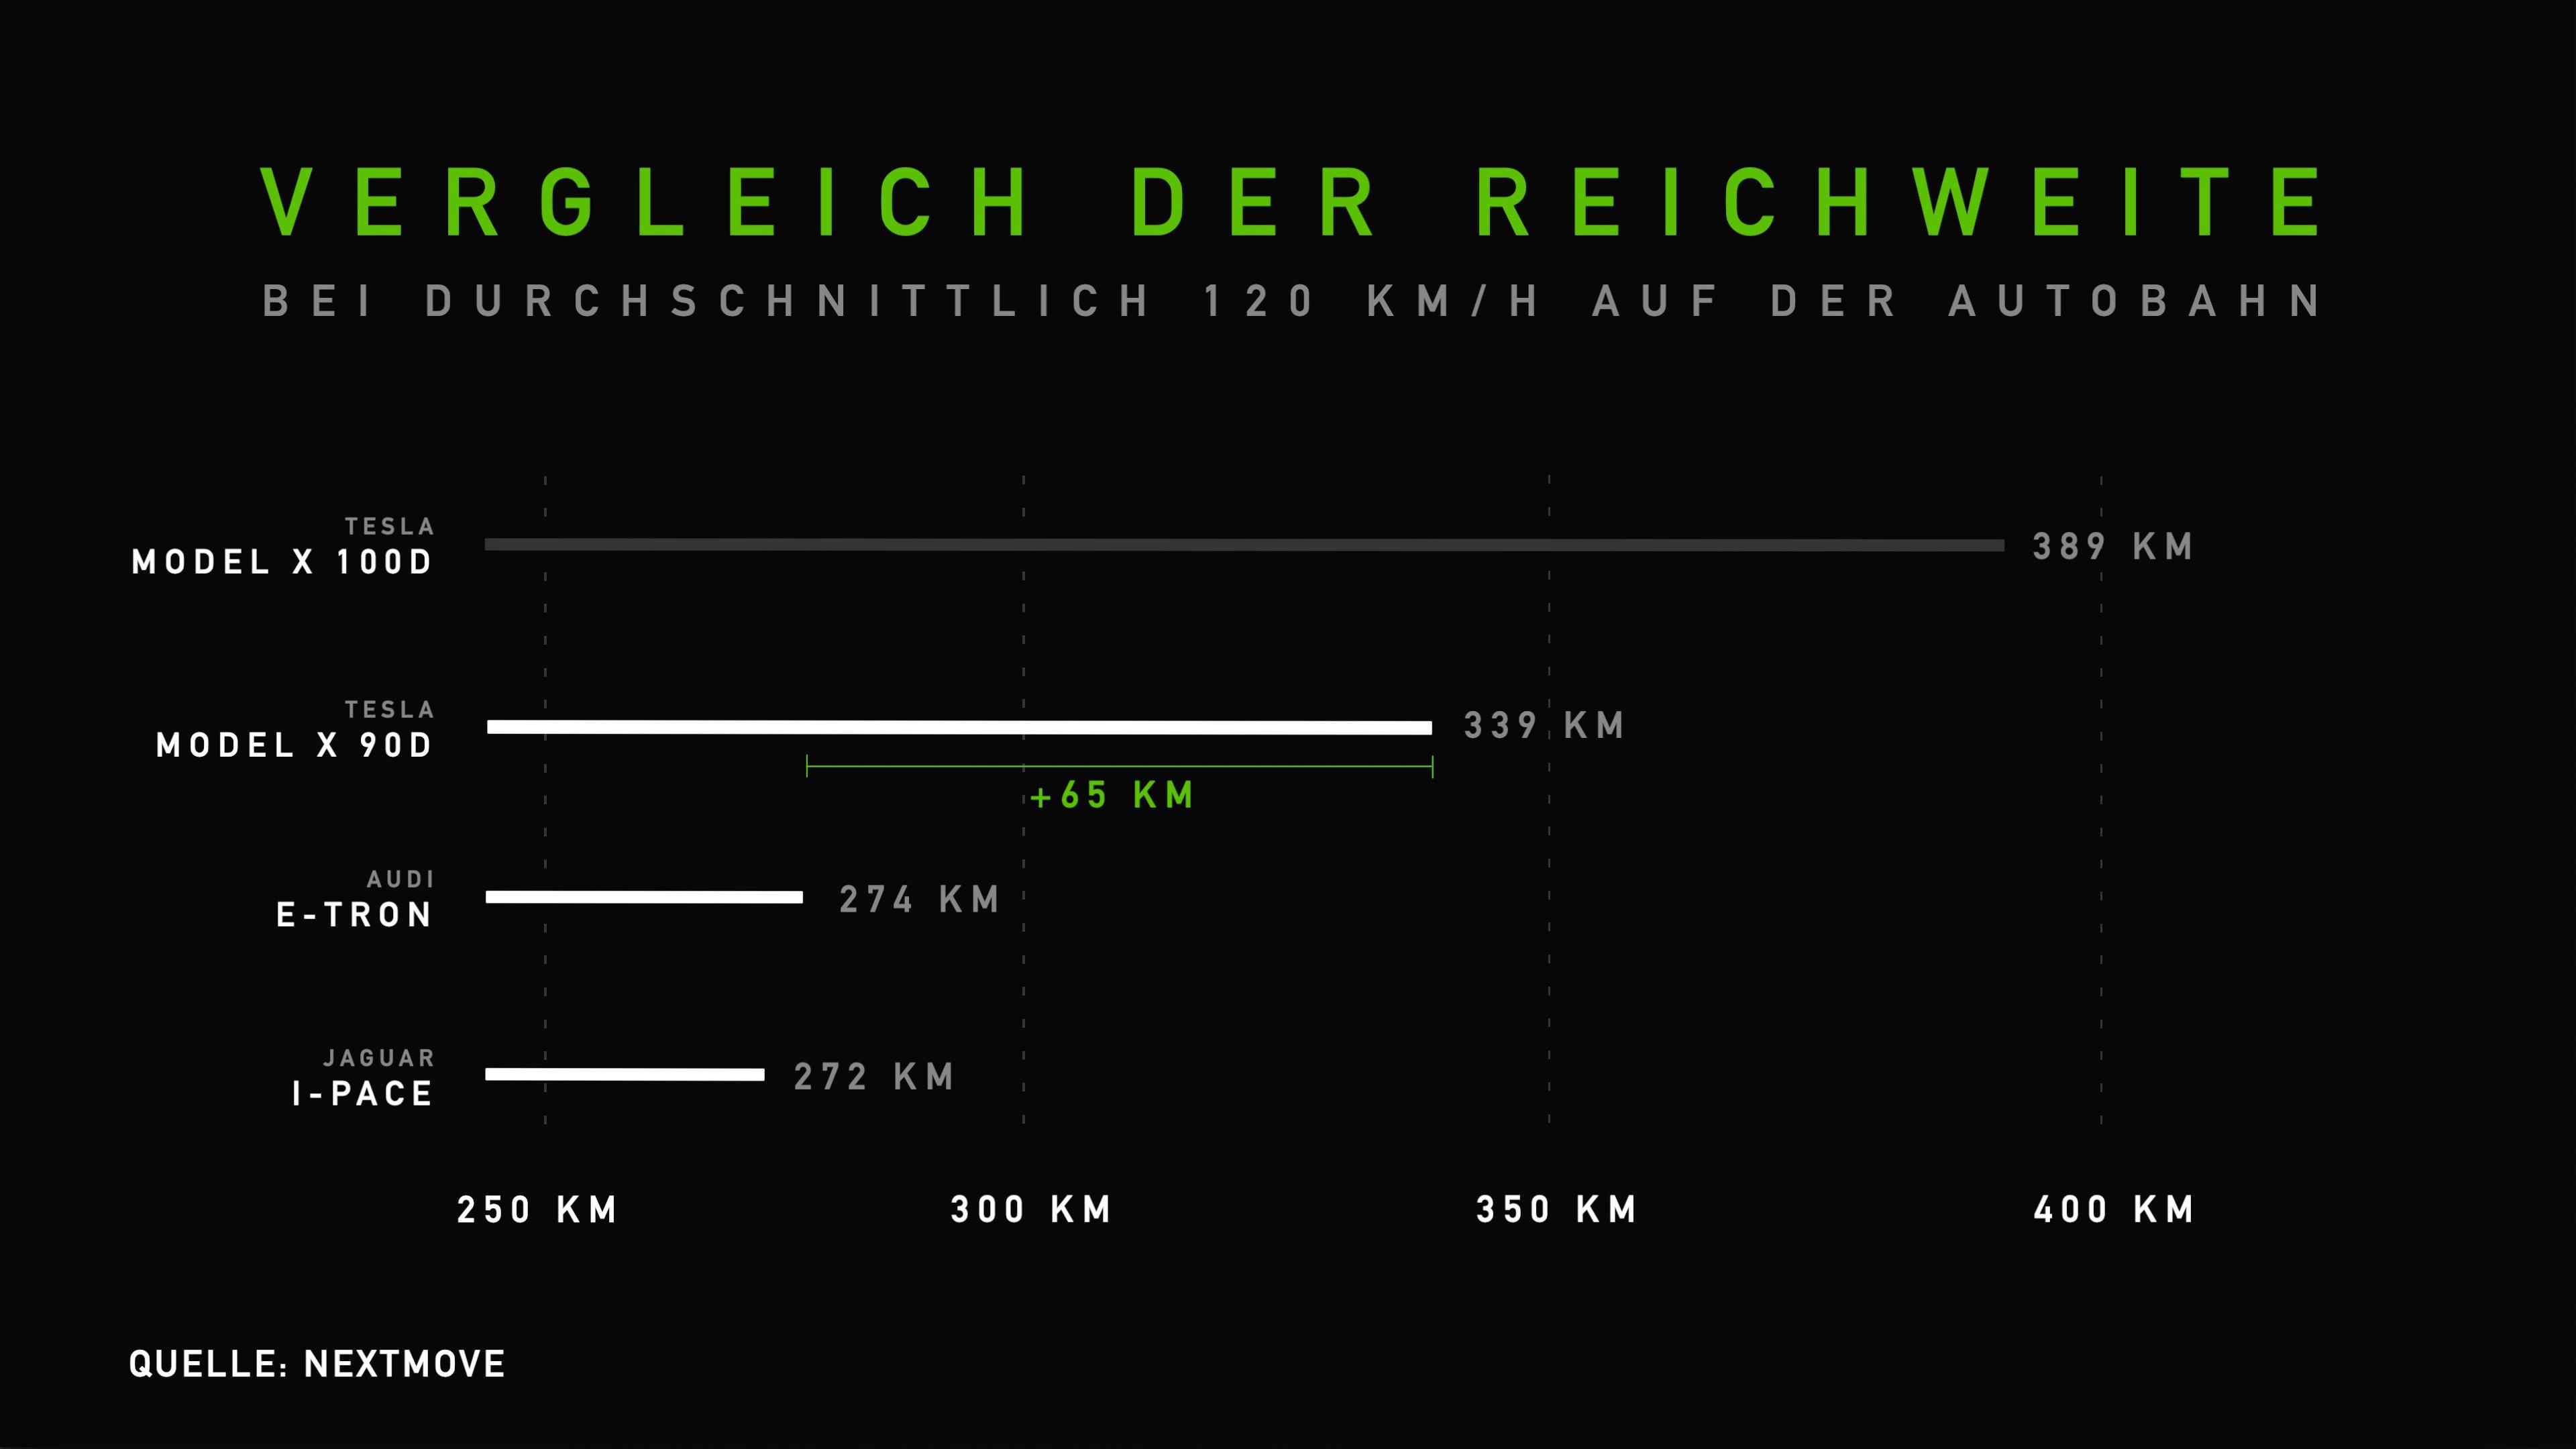 Vergleich Reichweite Audi e-tron, Jaguar i-Pace, Tesla Model X